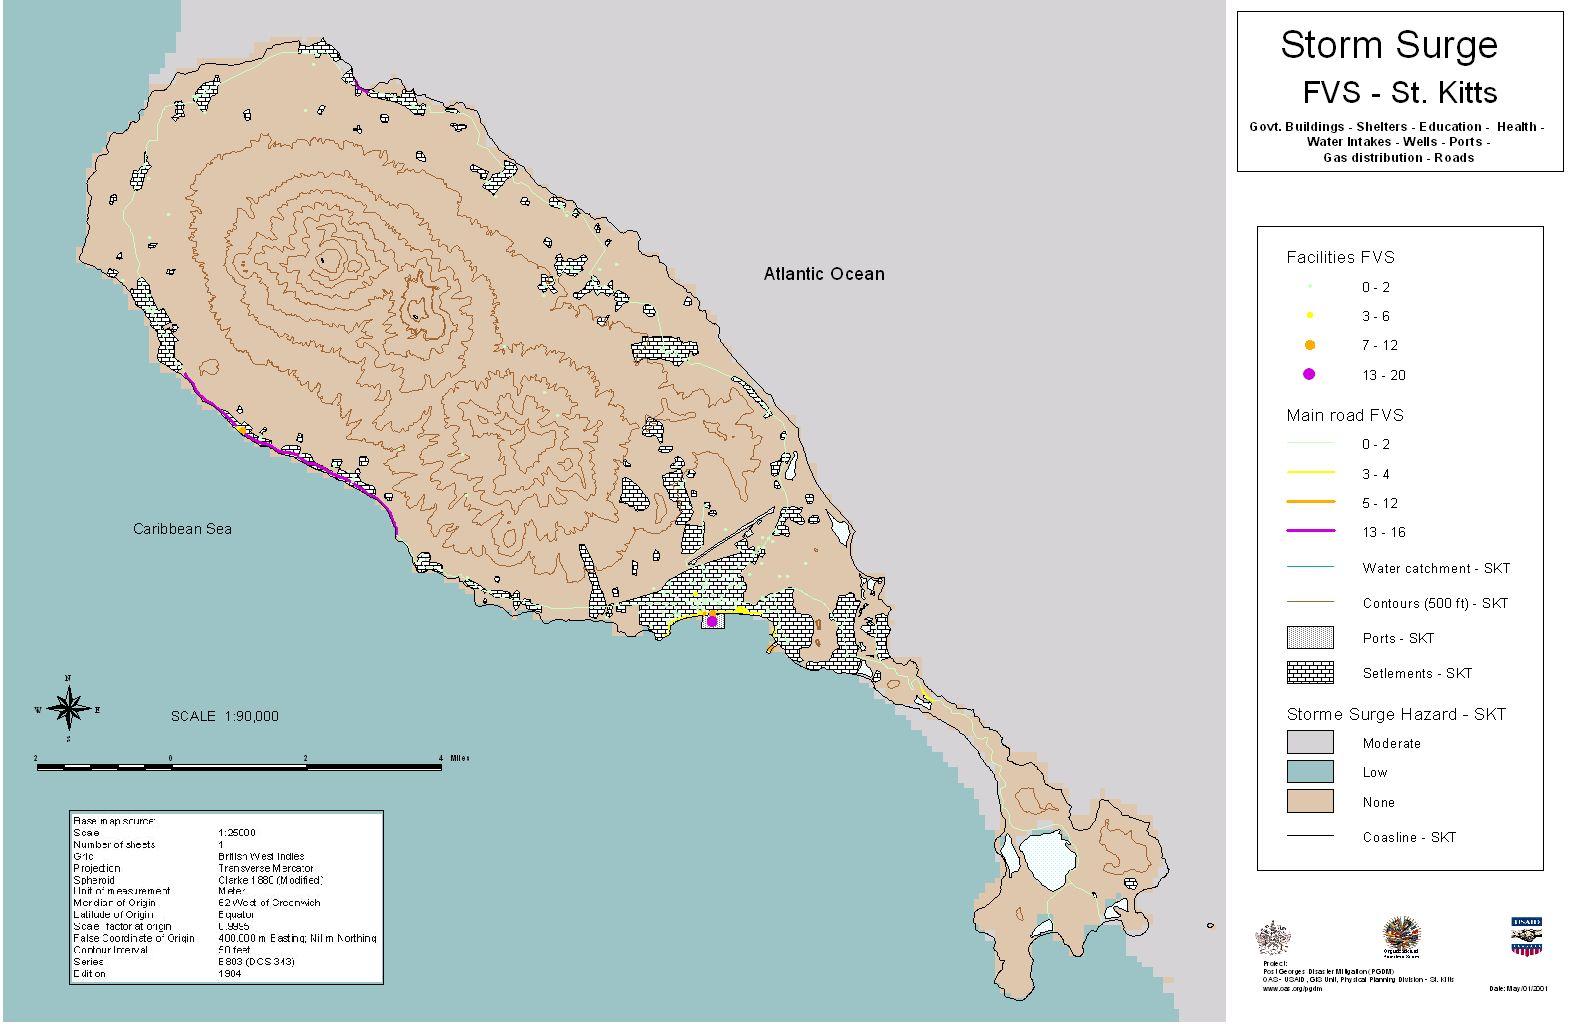 PGDM: St. Kitts/Nevis National Hazard Mitigation Policy/Plan, List ...